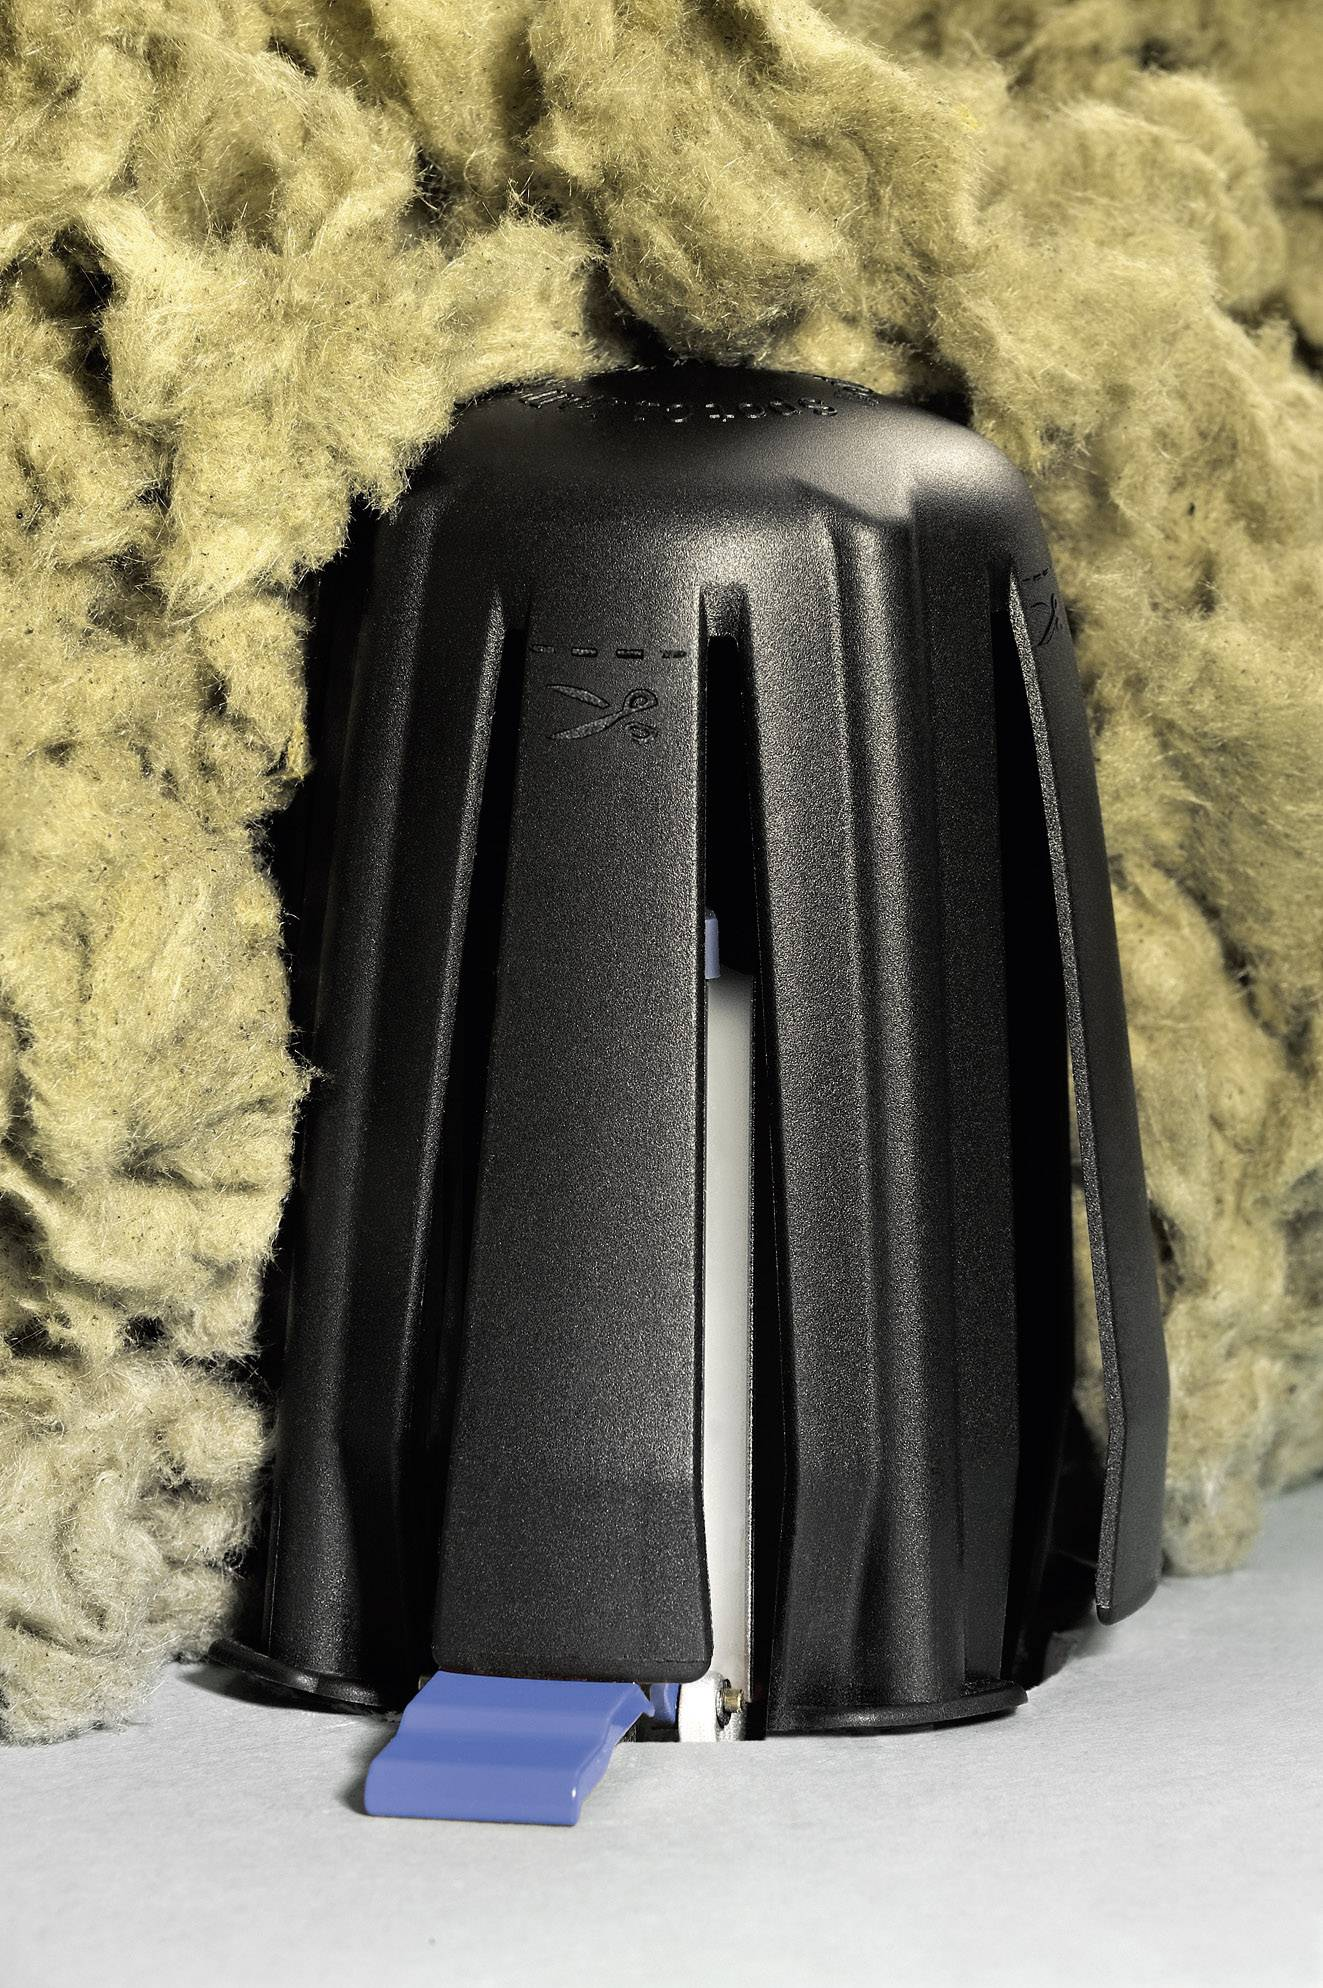 Distančný držiak HellermannTyton 148-00098, čierna